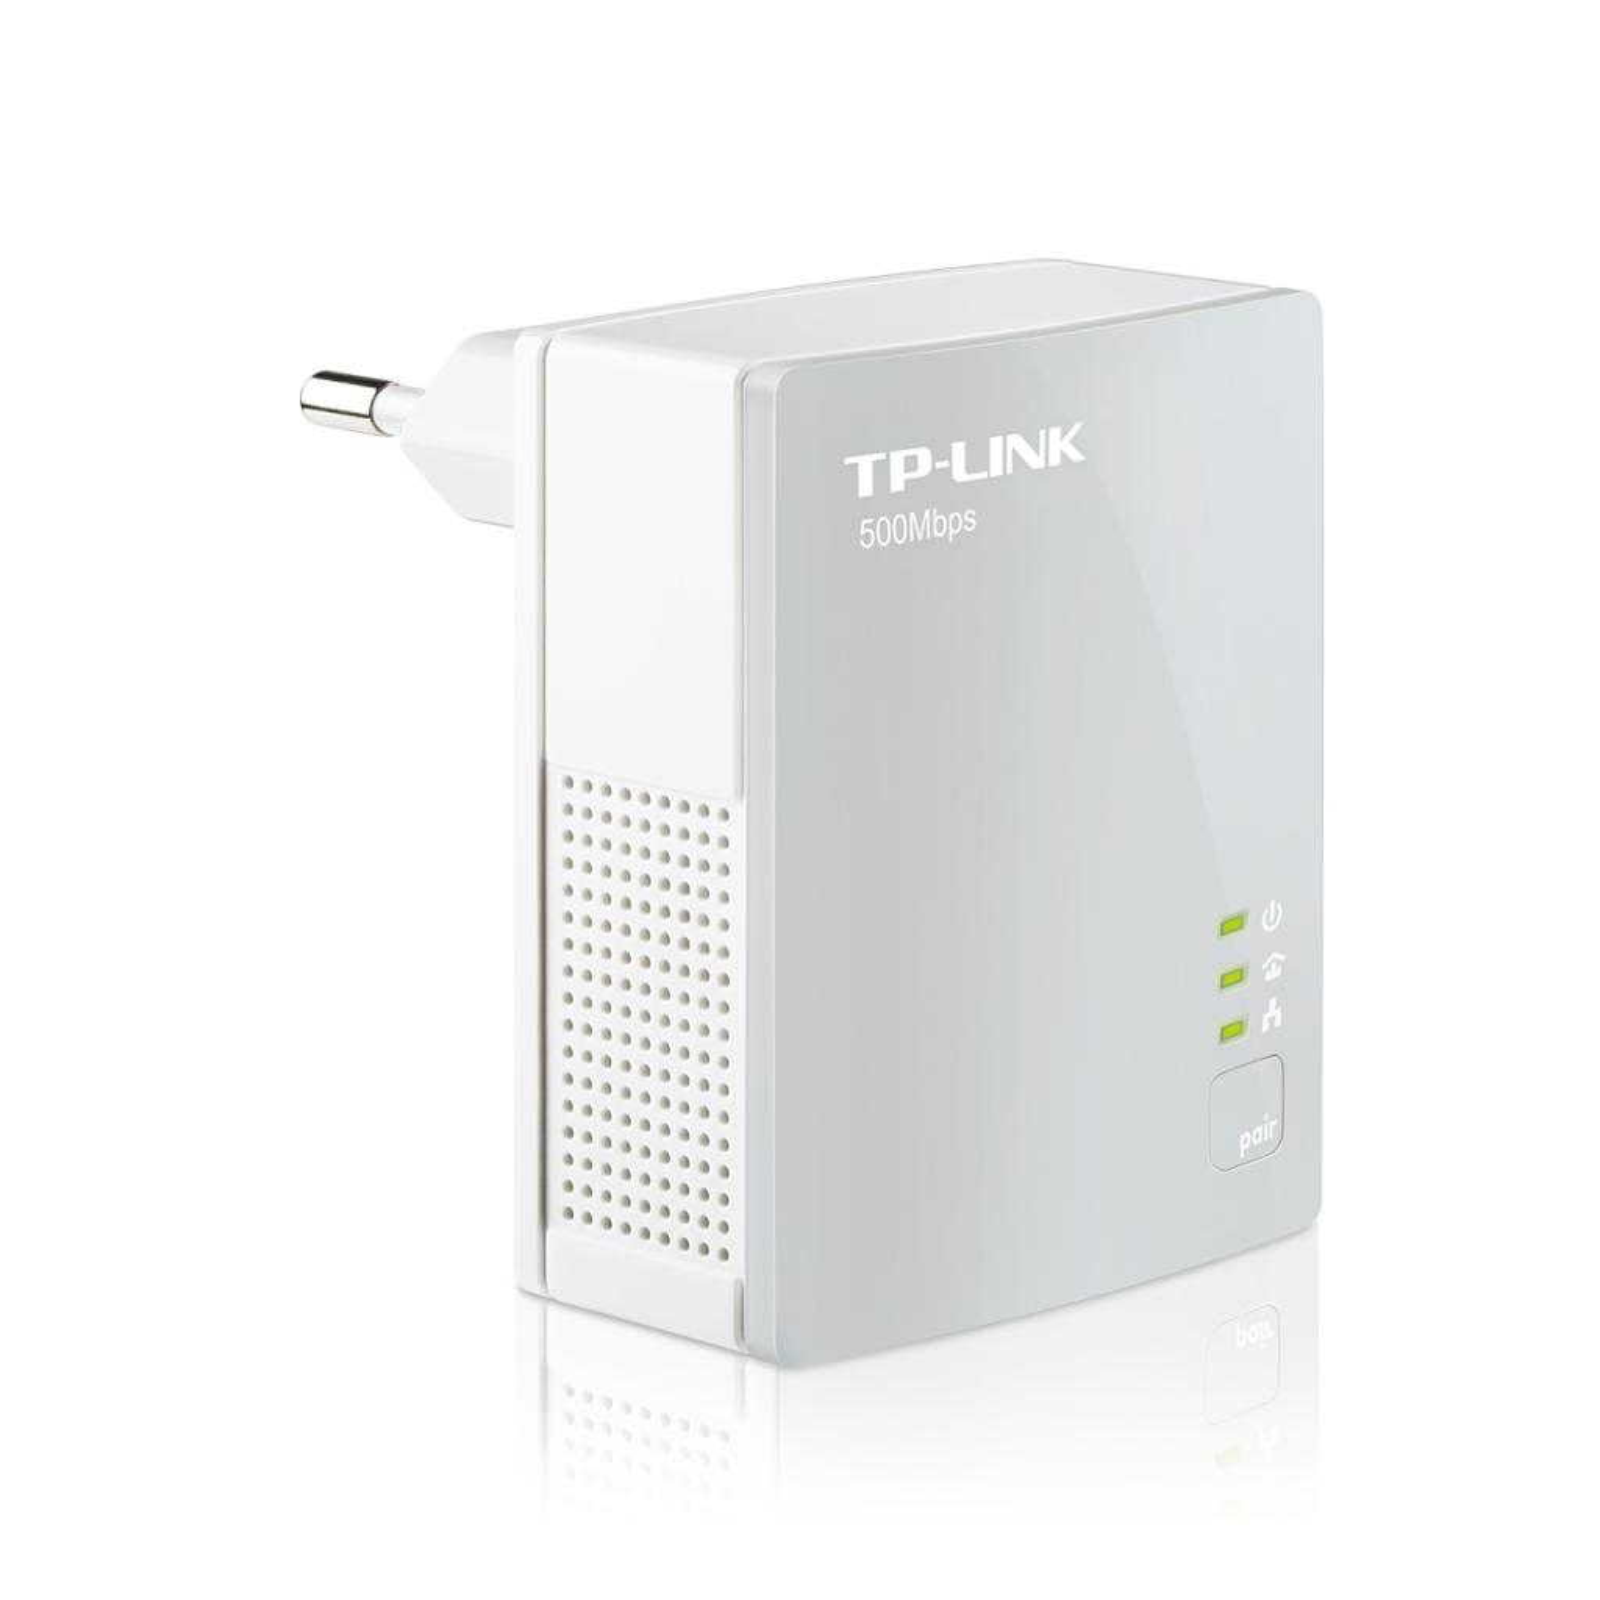 Адаптер Powerline TP-Link TL-PA4010 изображение 2